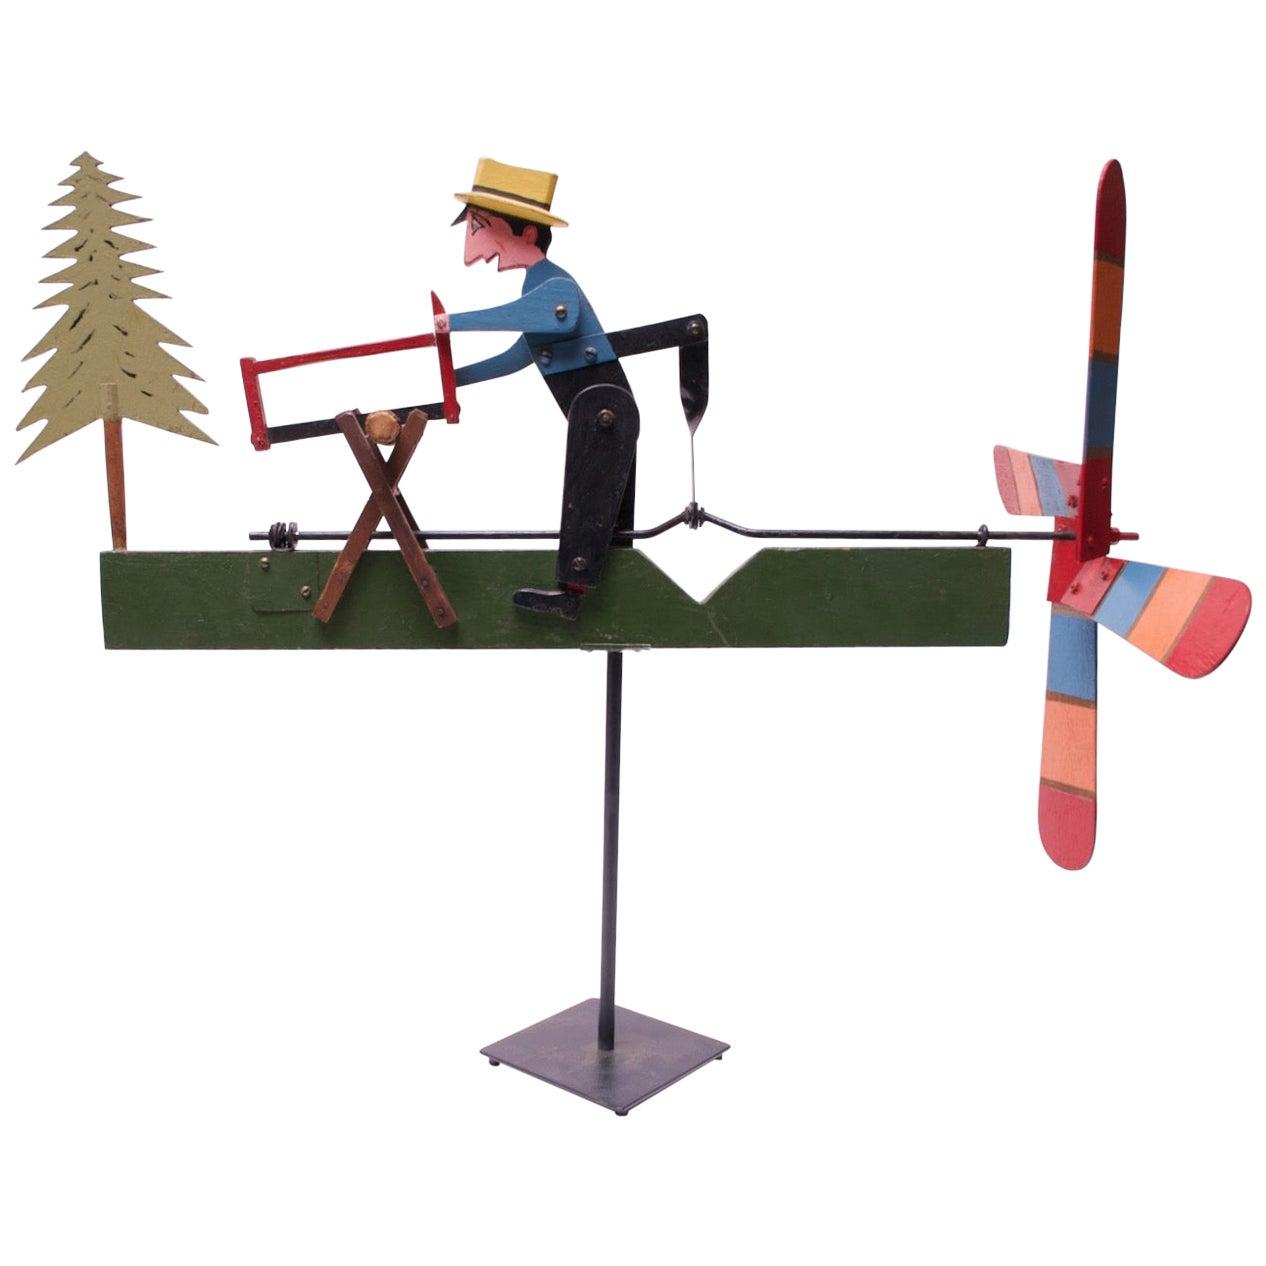 1940s American Folk Art Woodsman / Lumberjack Whirligig